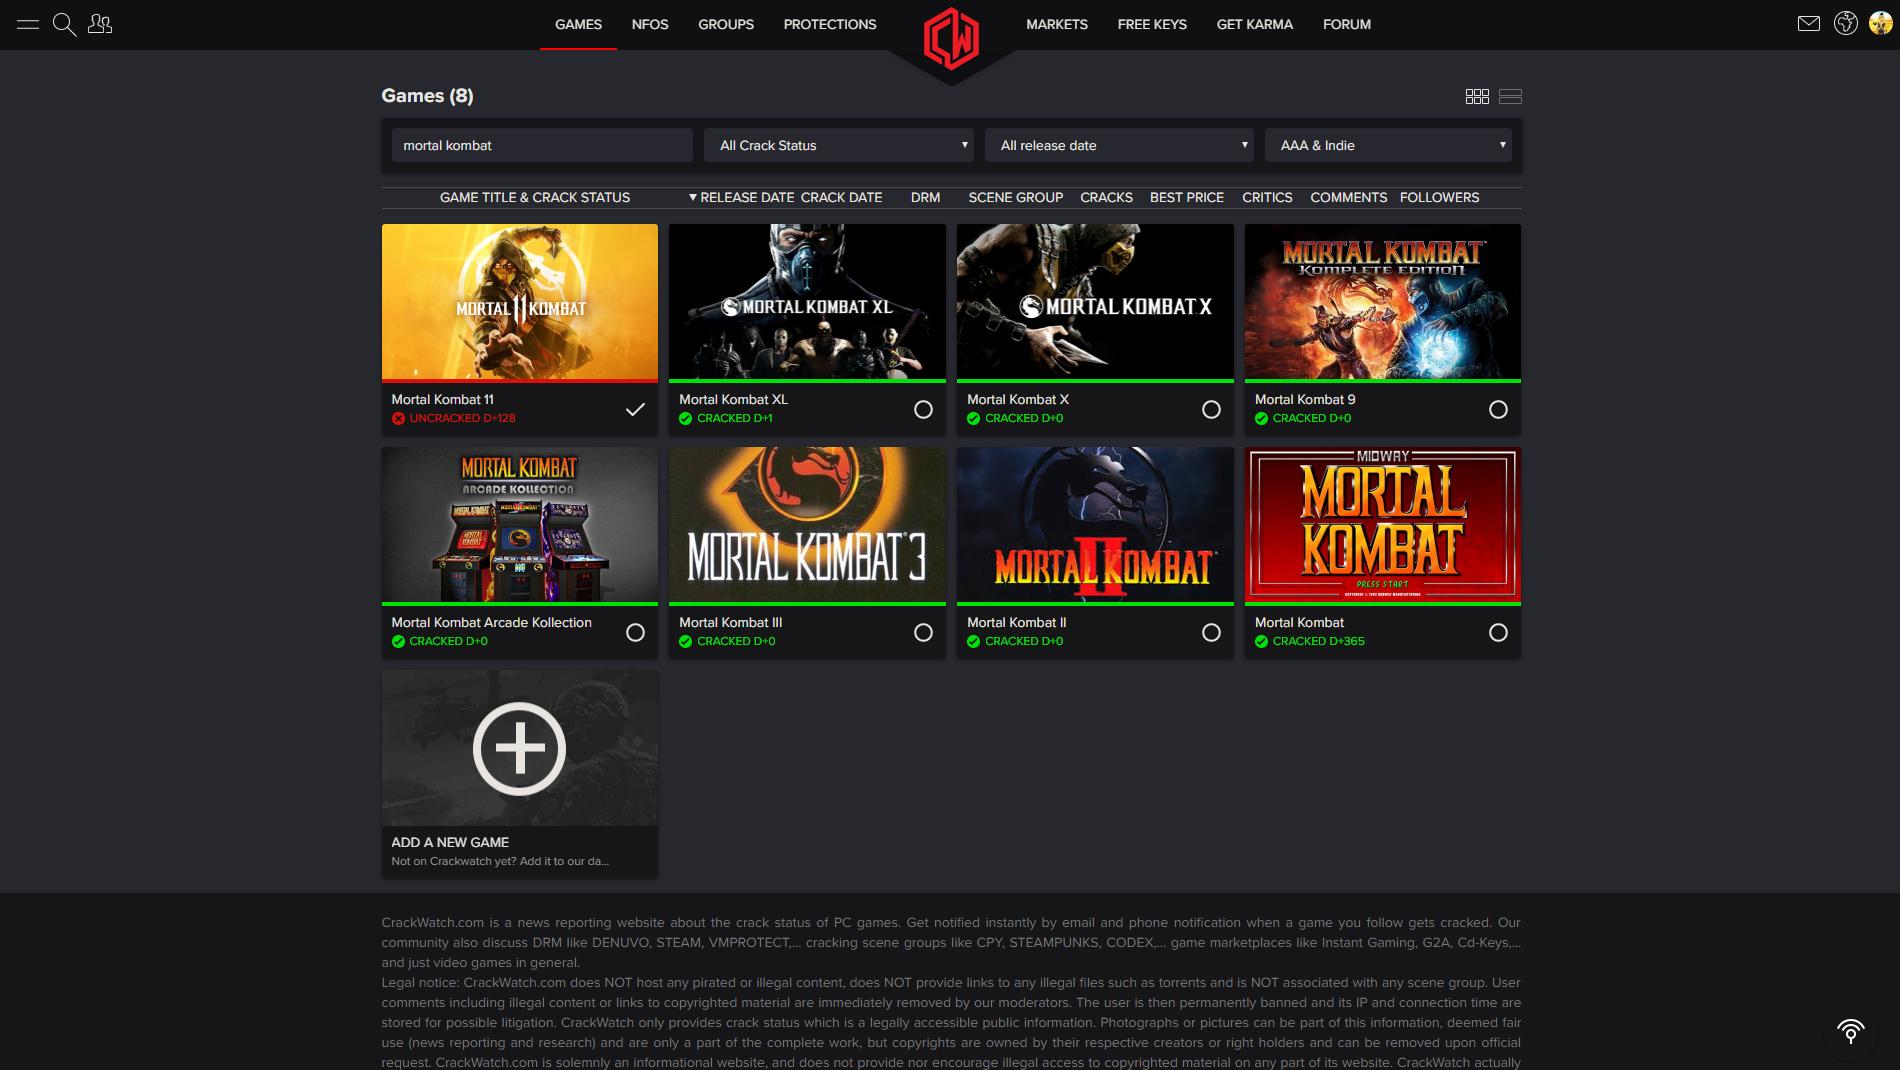 Mortal Kombat 11 Crack Status | CrackWatch